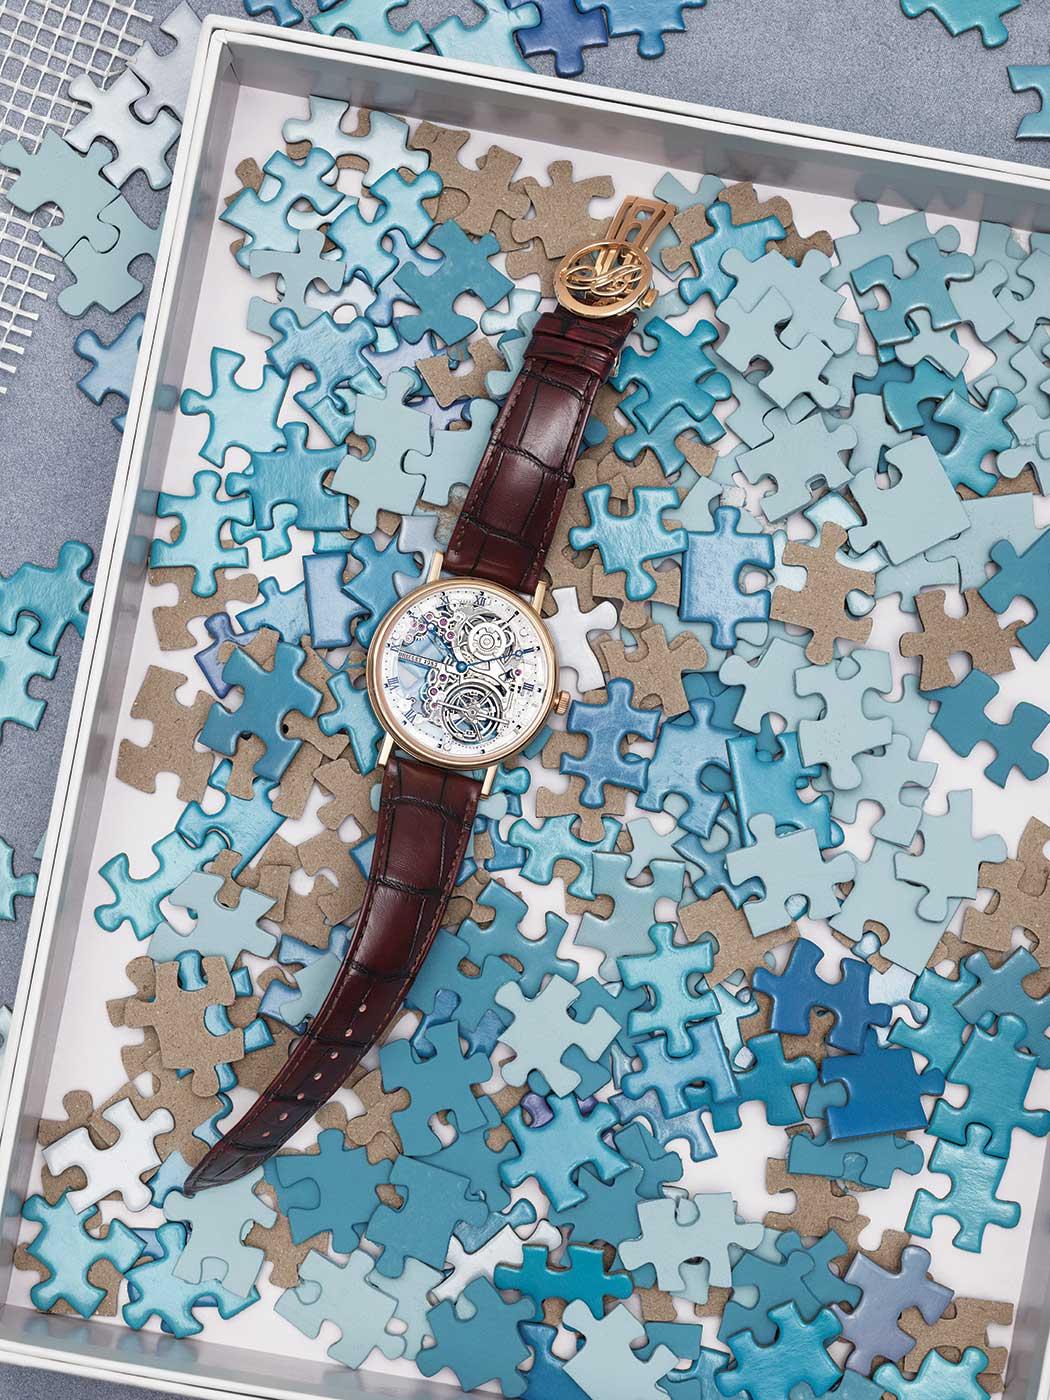 191029-WSJ-Spring20-Jewelry_Box-Breguet-53415-53421-Base_19198_v1_CMYK_QC